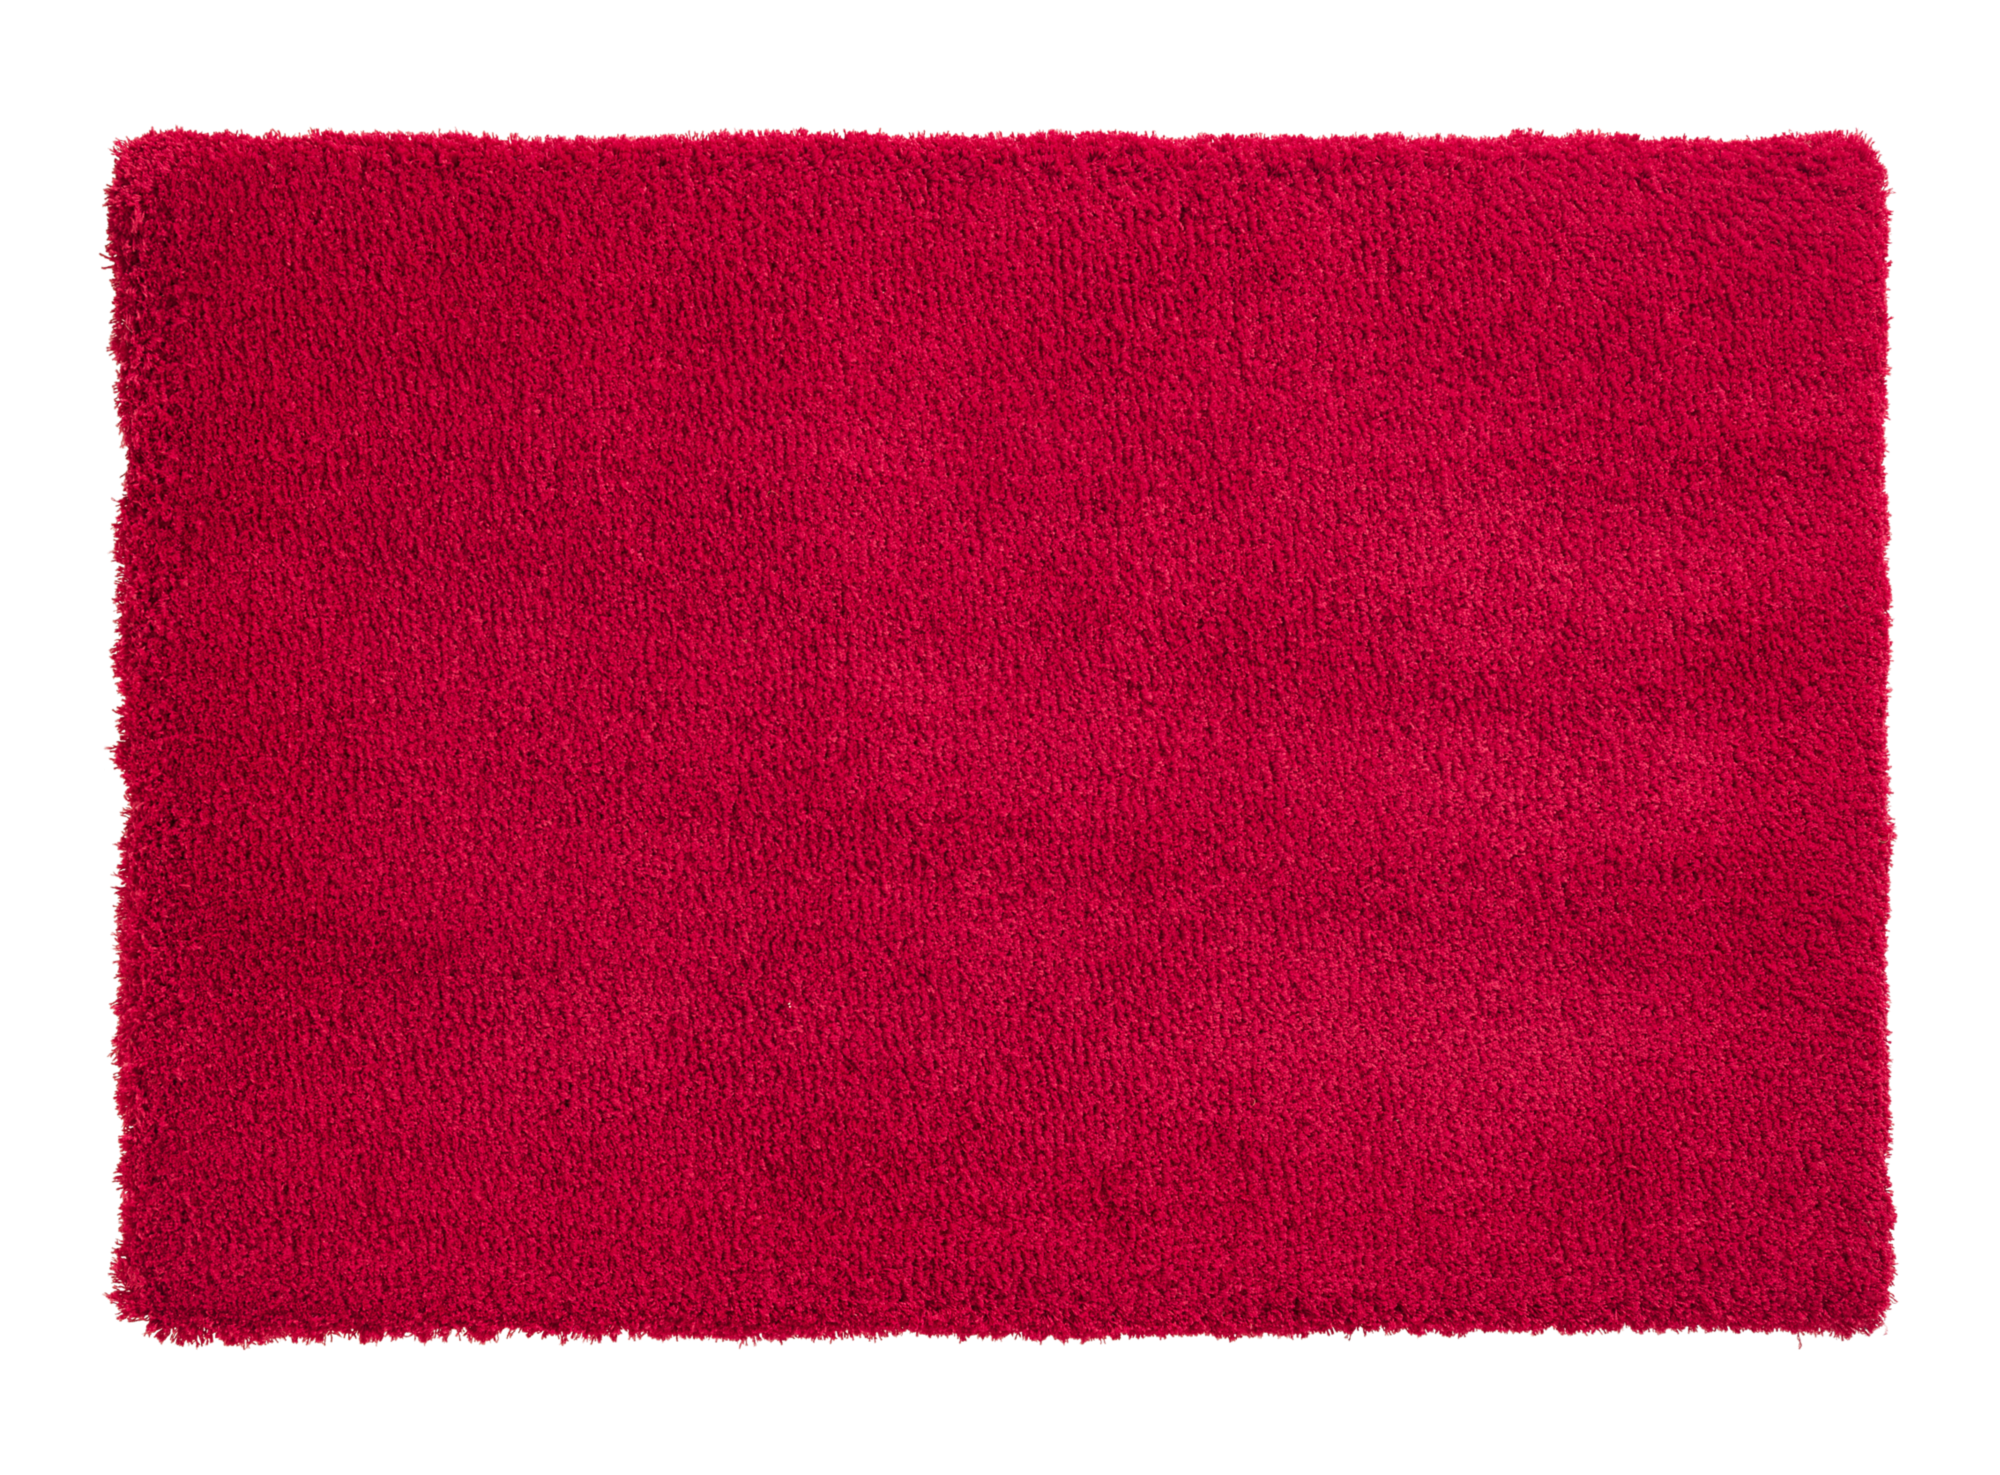 Tapis 60x90 100% polyester coloris rouge densite 1800gr/m2  non lavab ...